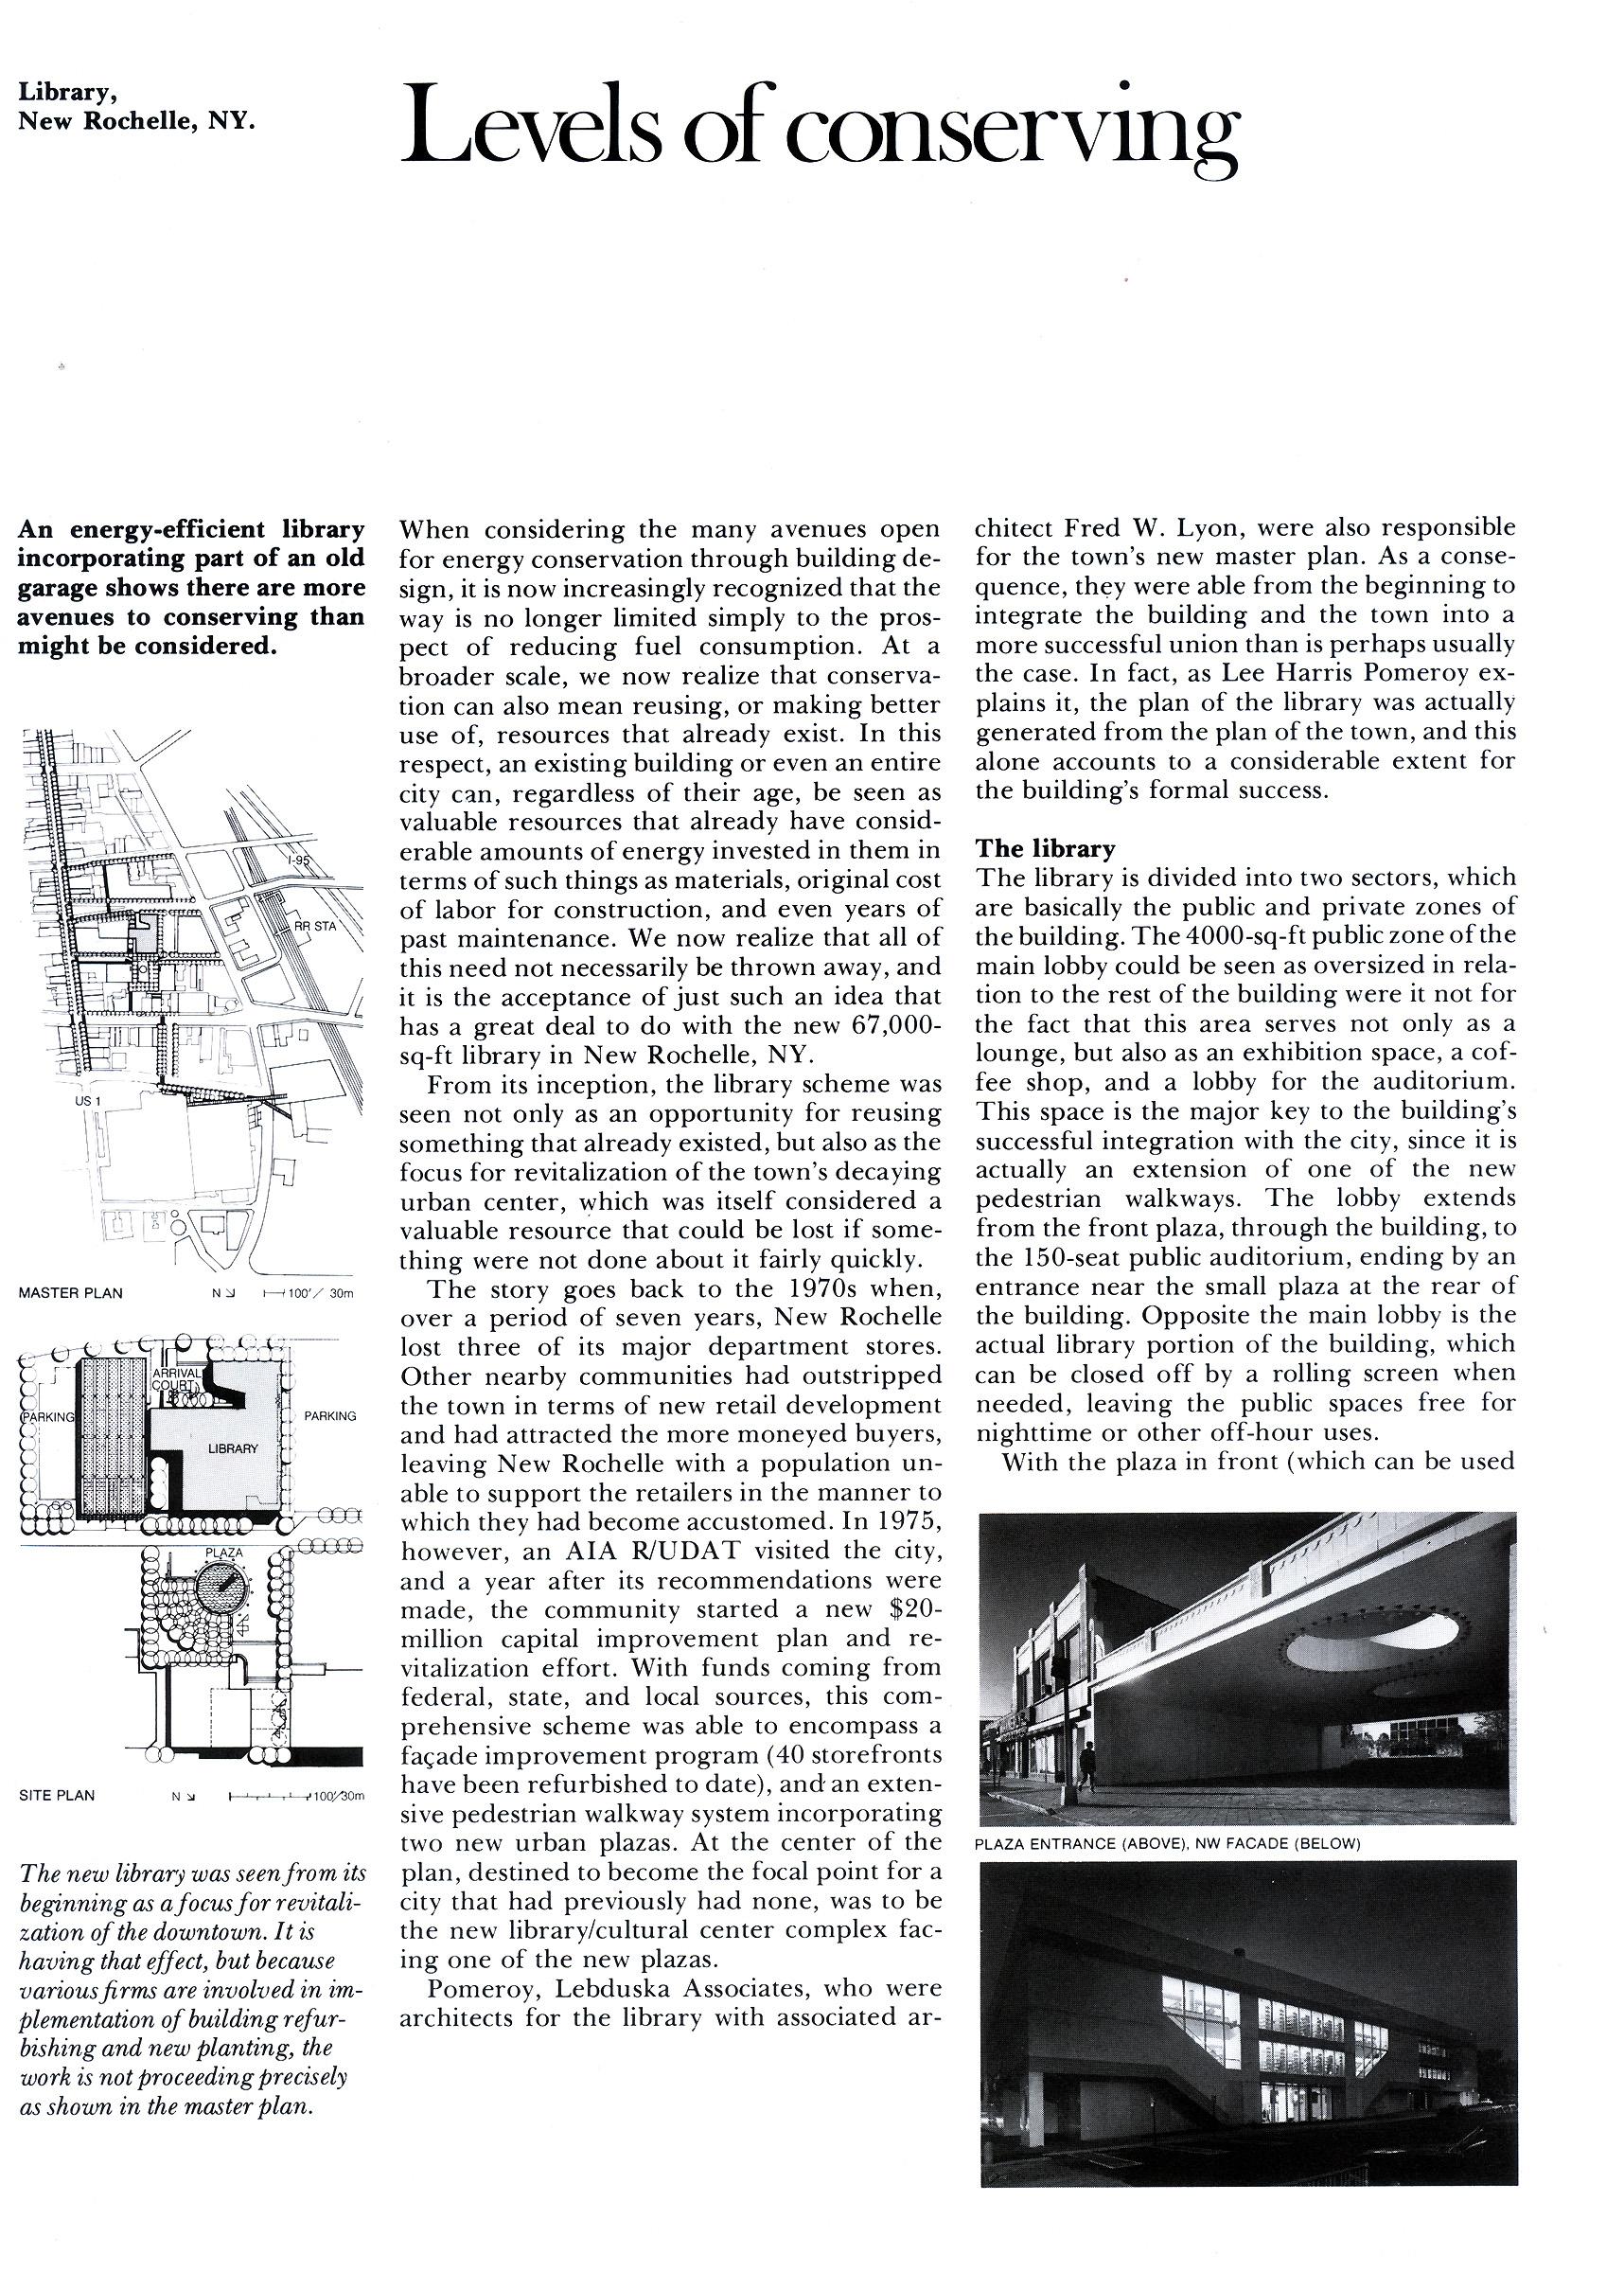 New Rochelle Page 2.jpg